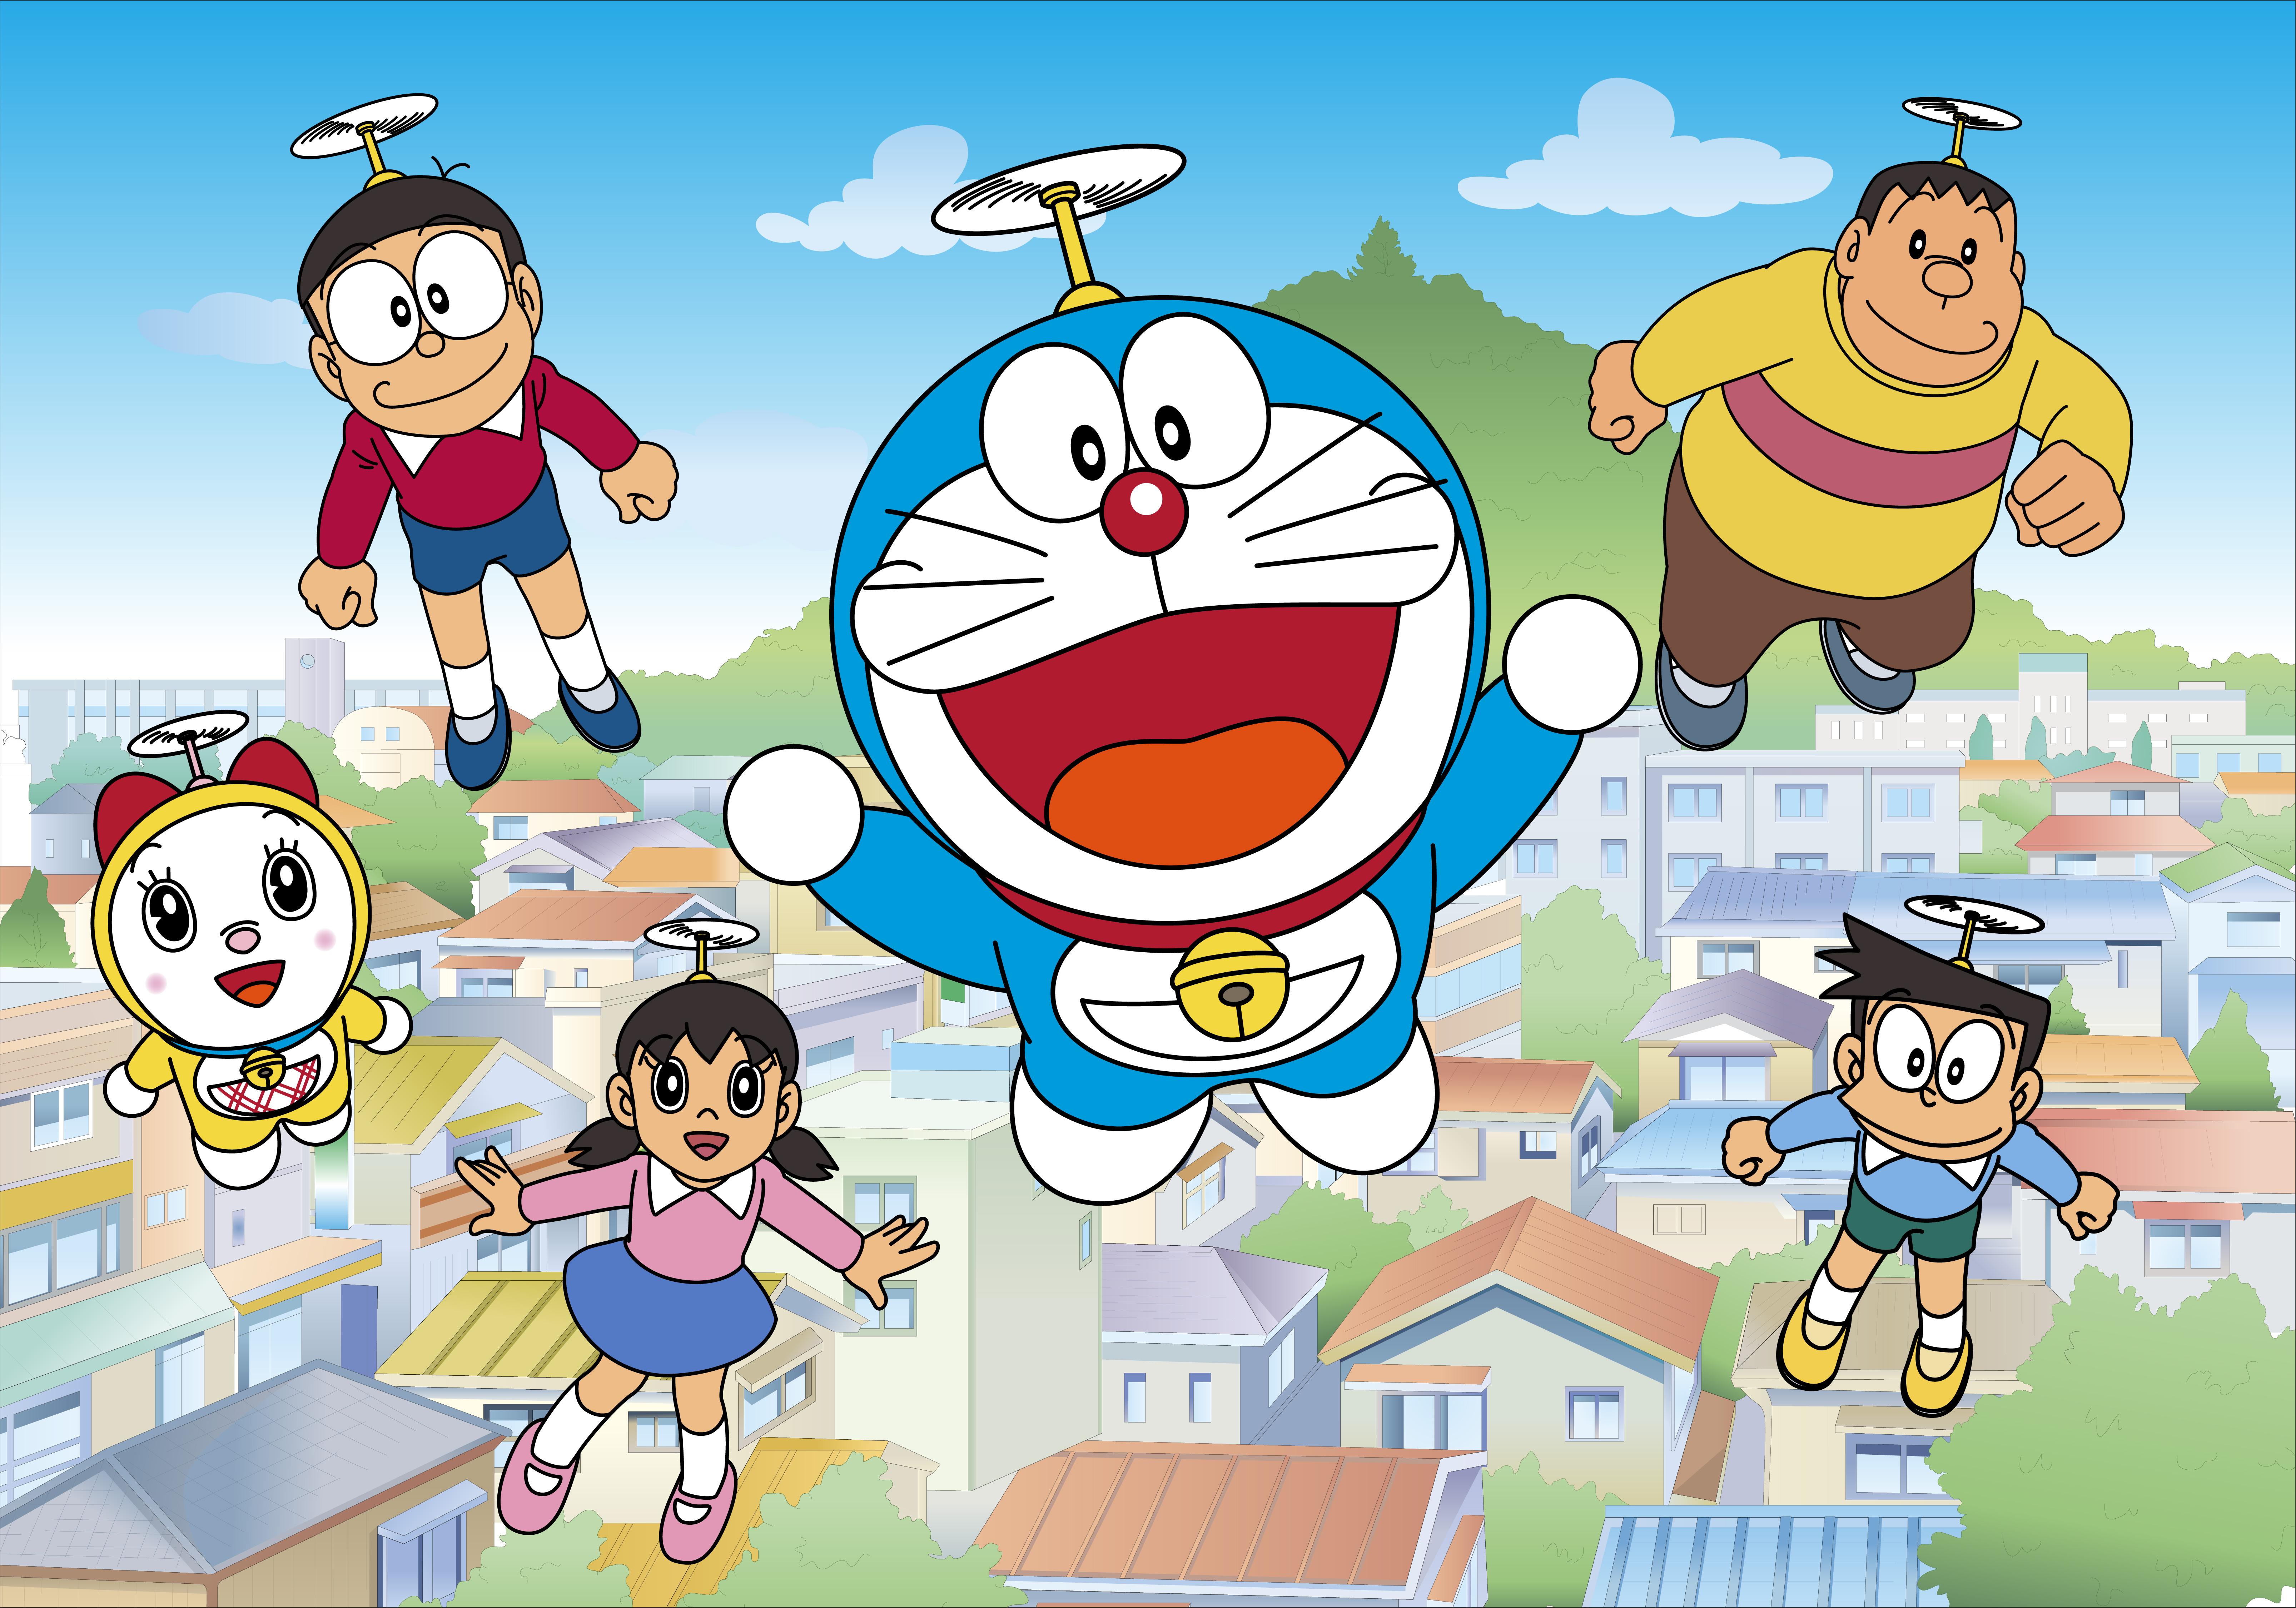 Doraemon-imagen-gen-rica.jpg